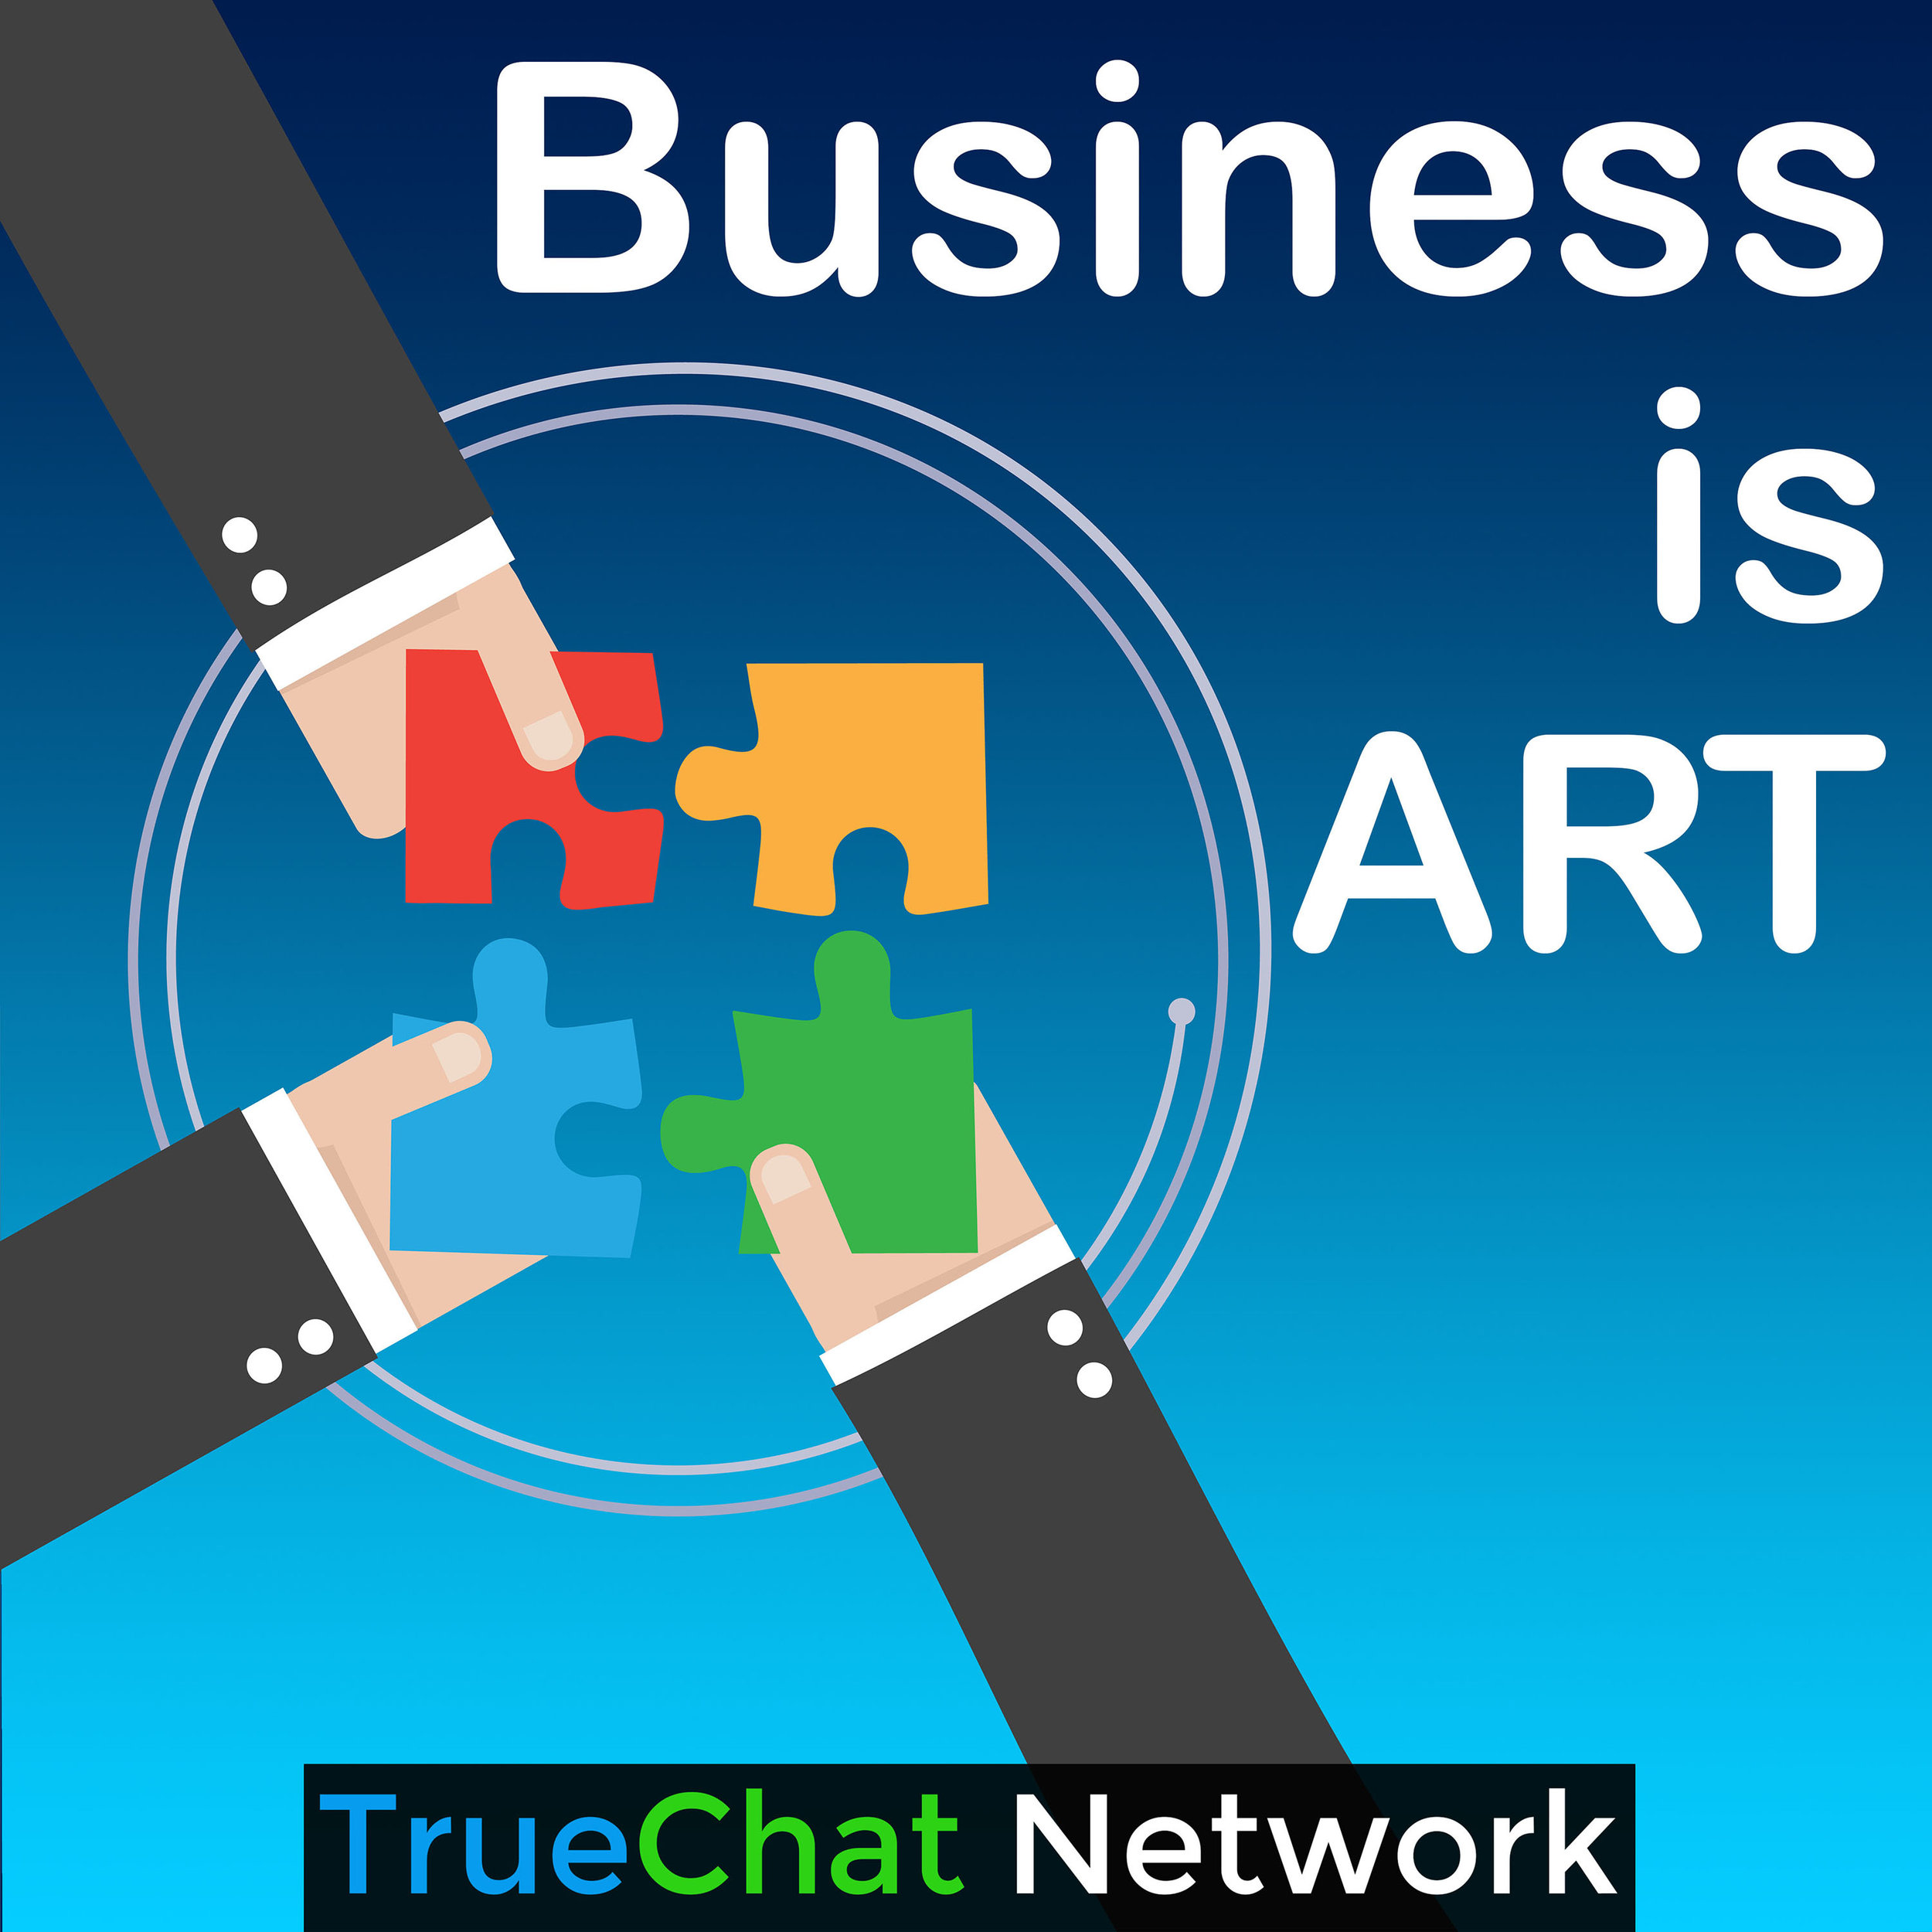 Business is Art 2018 Logo blue gradient.jpg